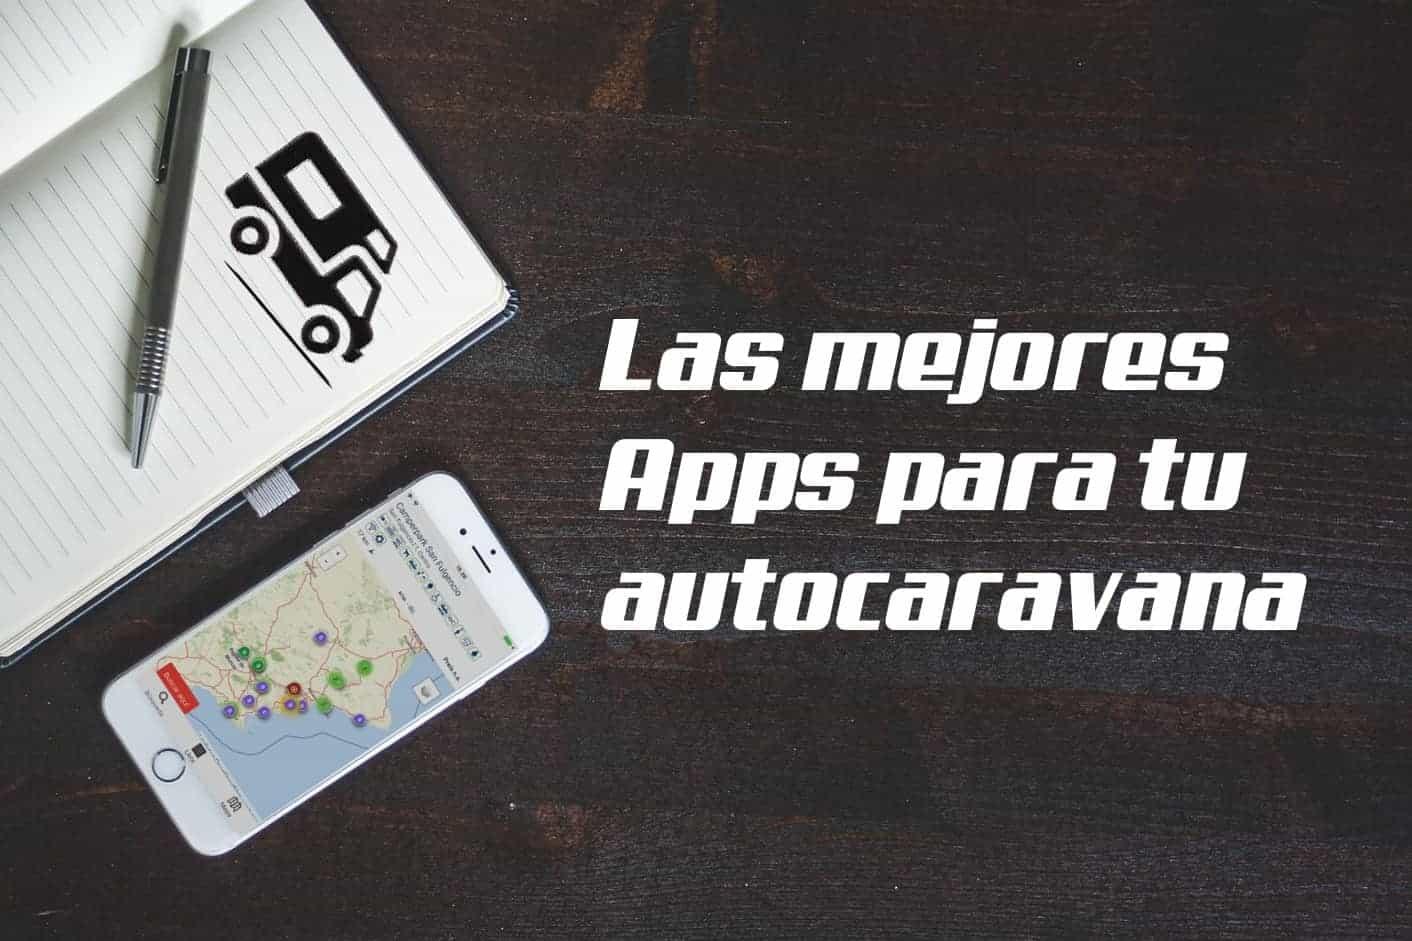 mejores apps para tu autocaravana